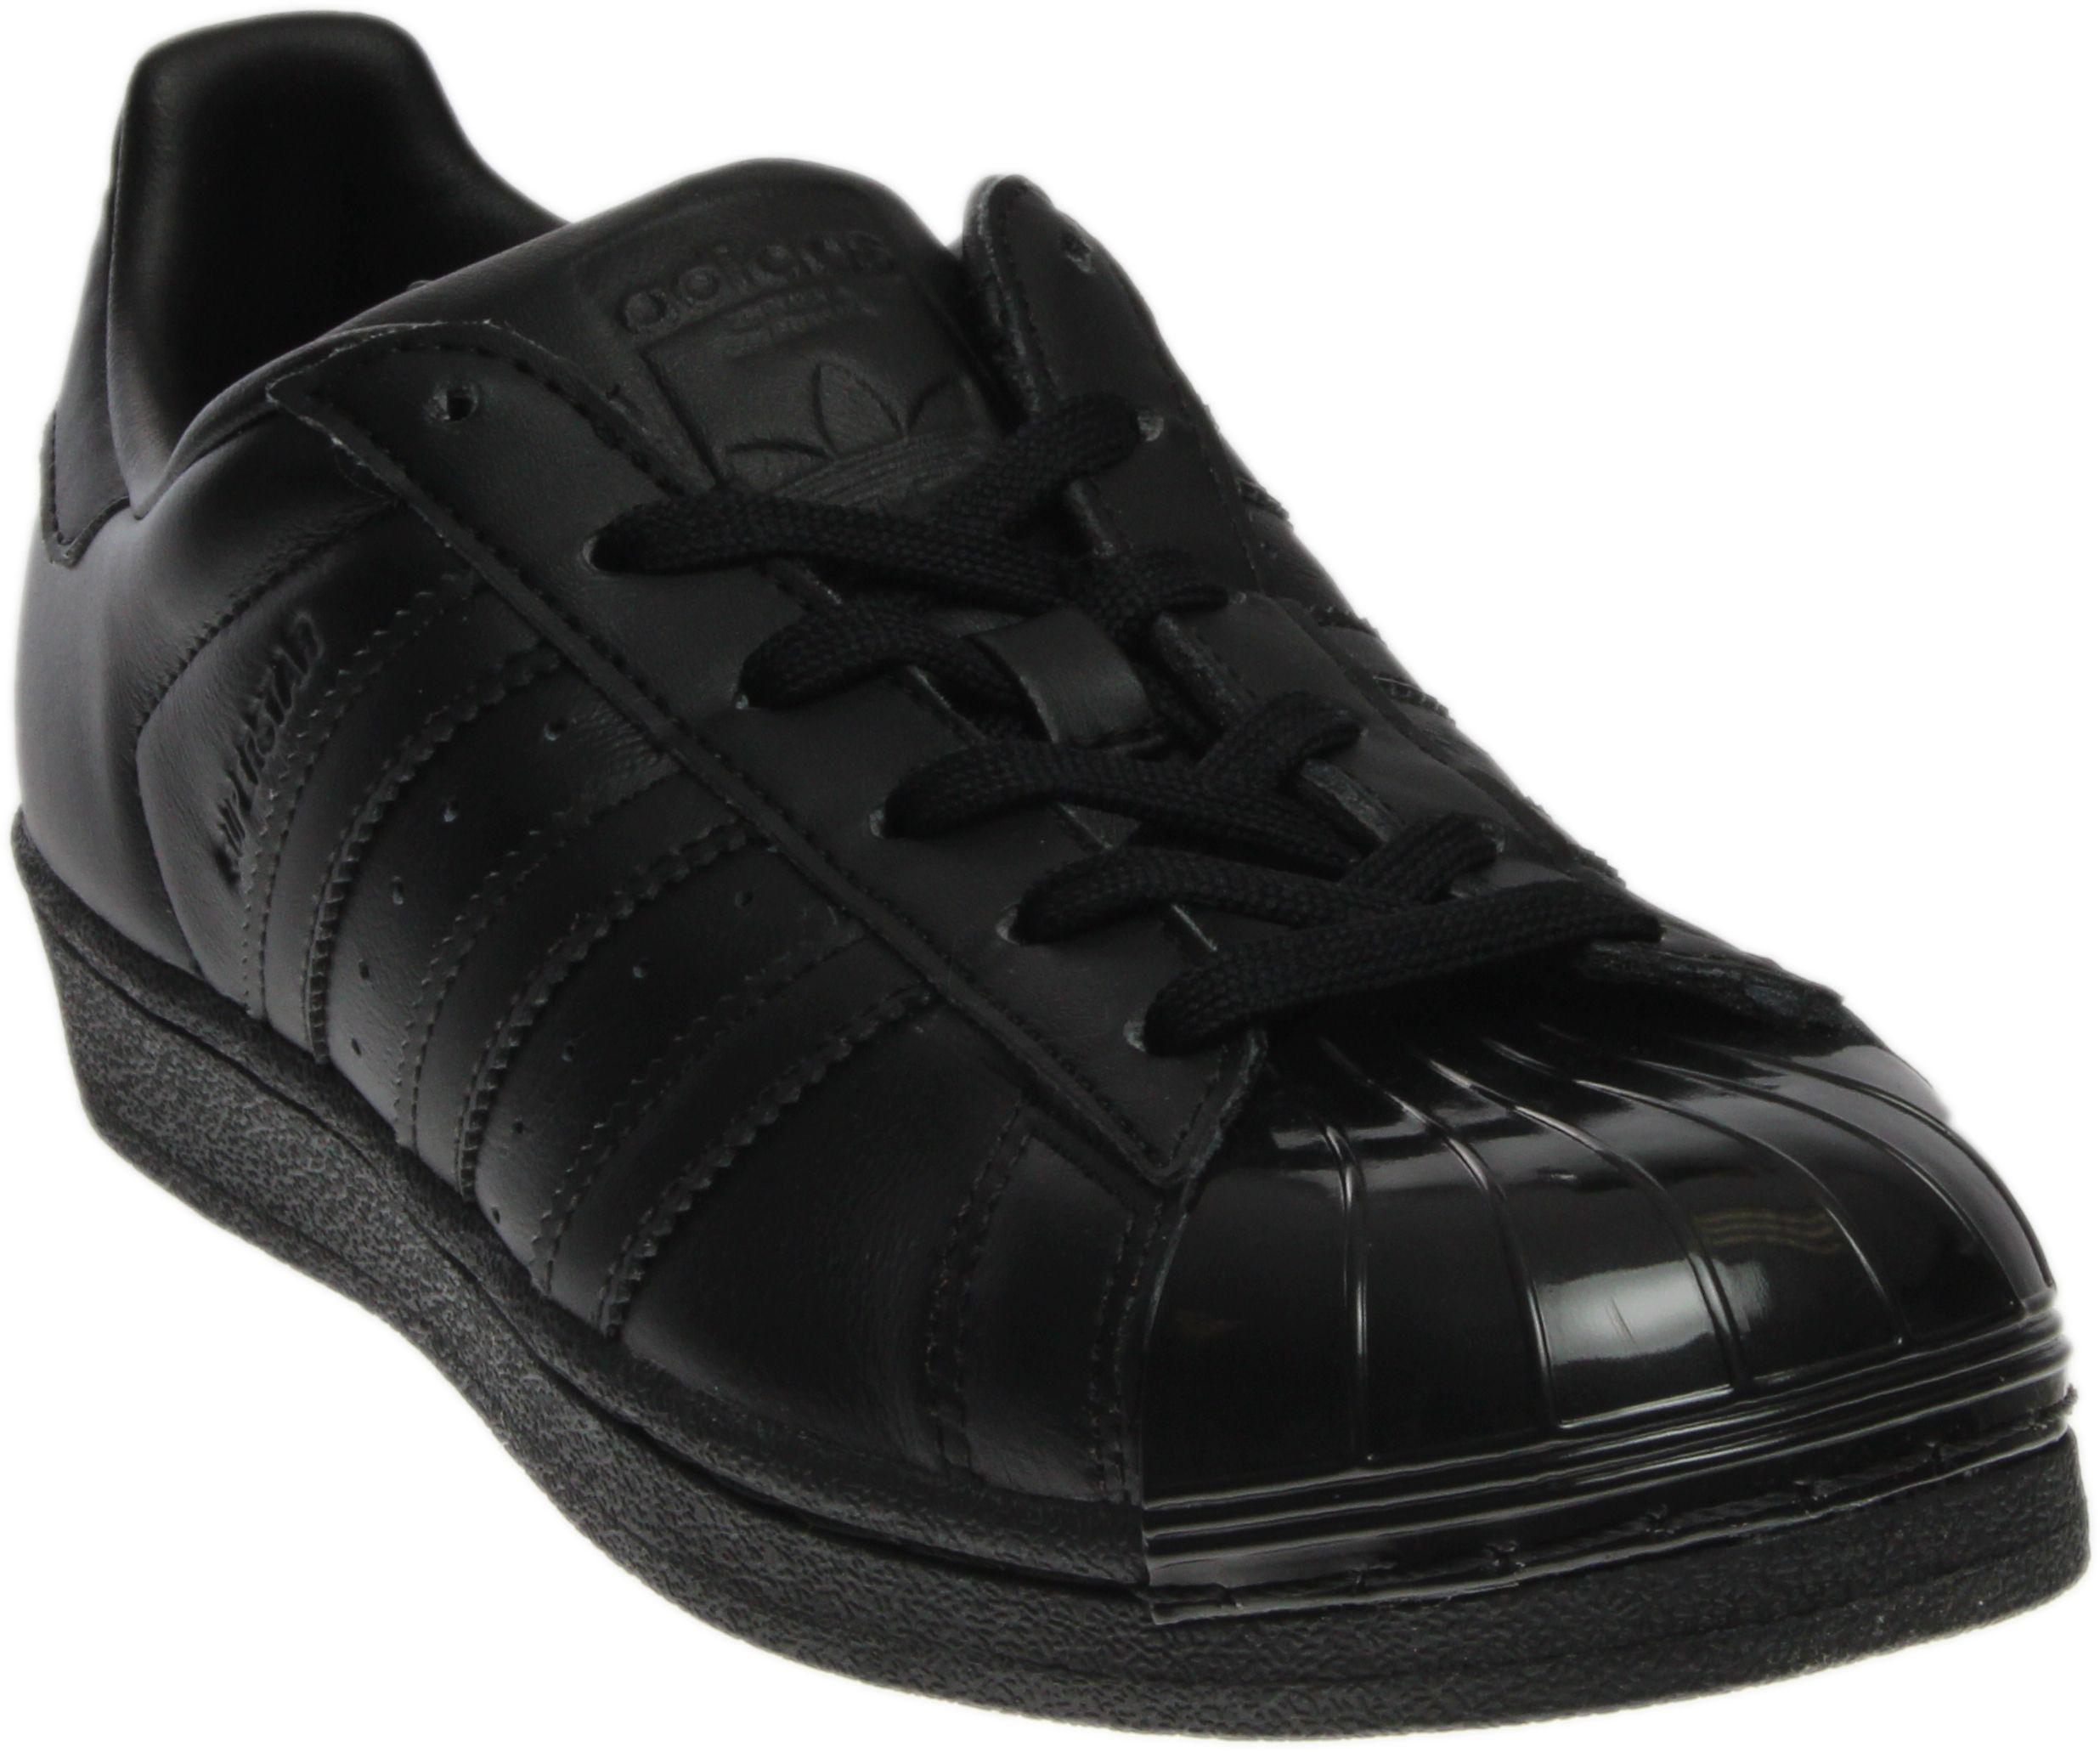 buy online e4395 c6c33 Lyst - adidas Superstar Glossy Toe in Black